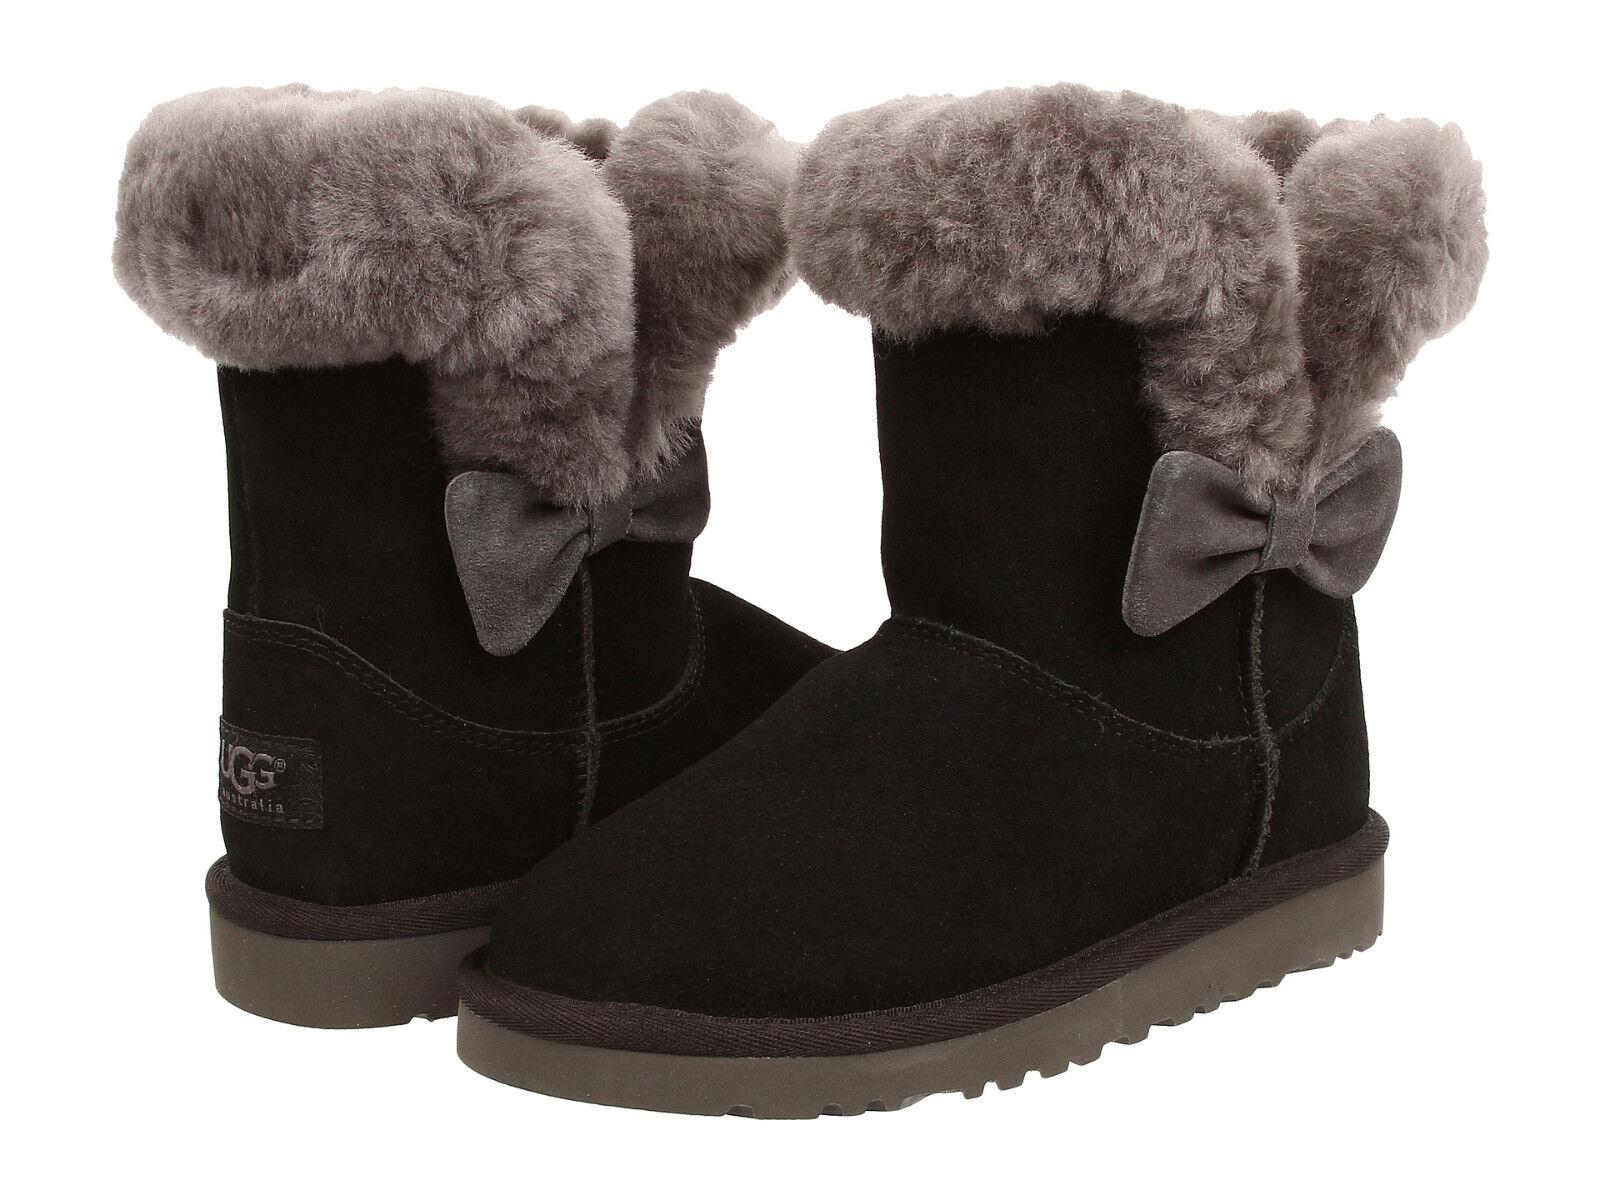 99daa1d46bb Kids UGG Australia Kourtney Boot 1005398K Black Suede 100% Authentic Brand  New